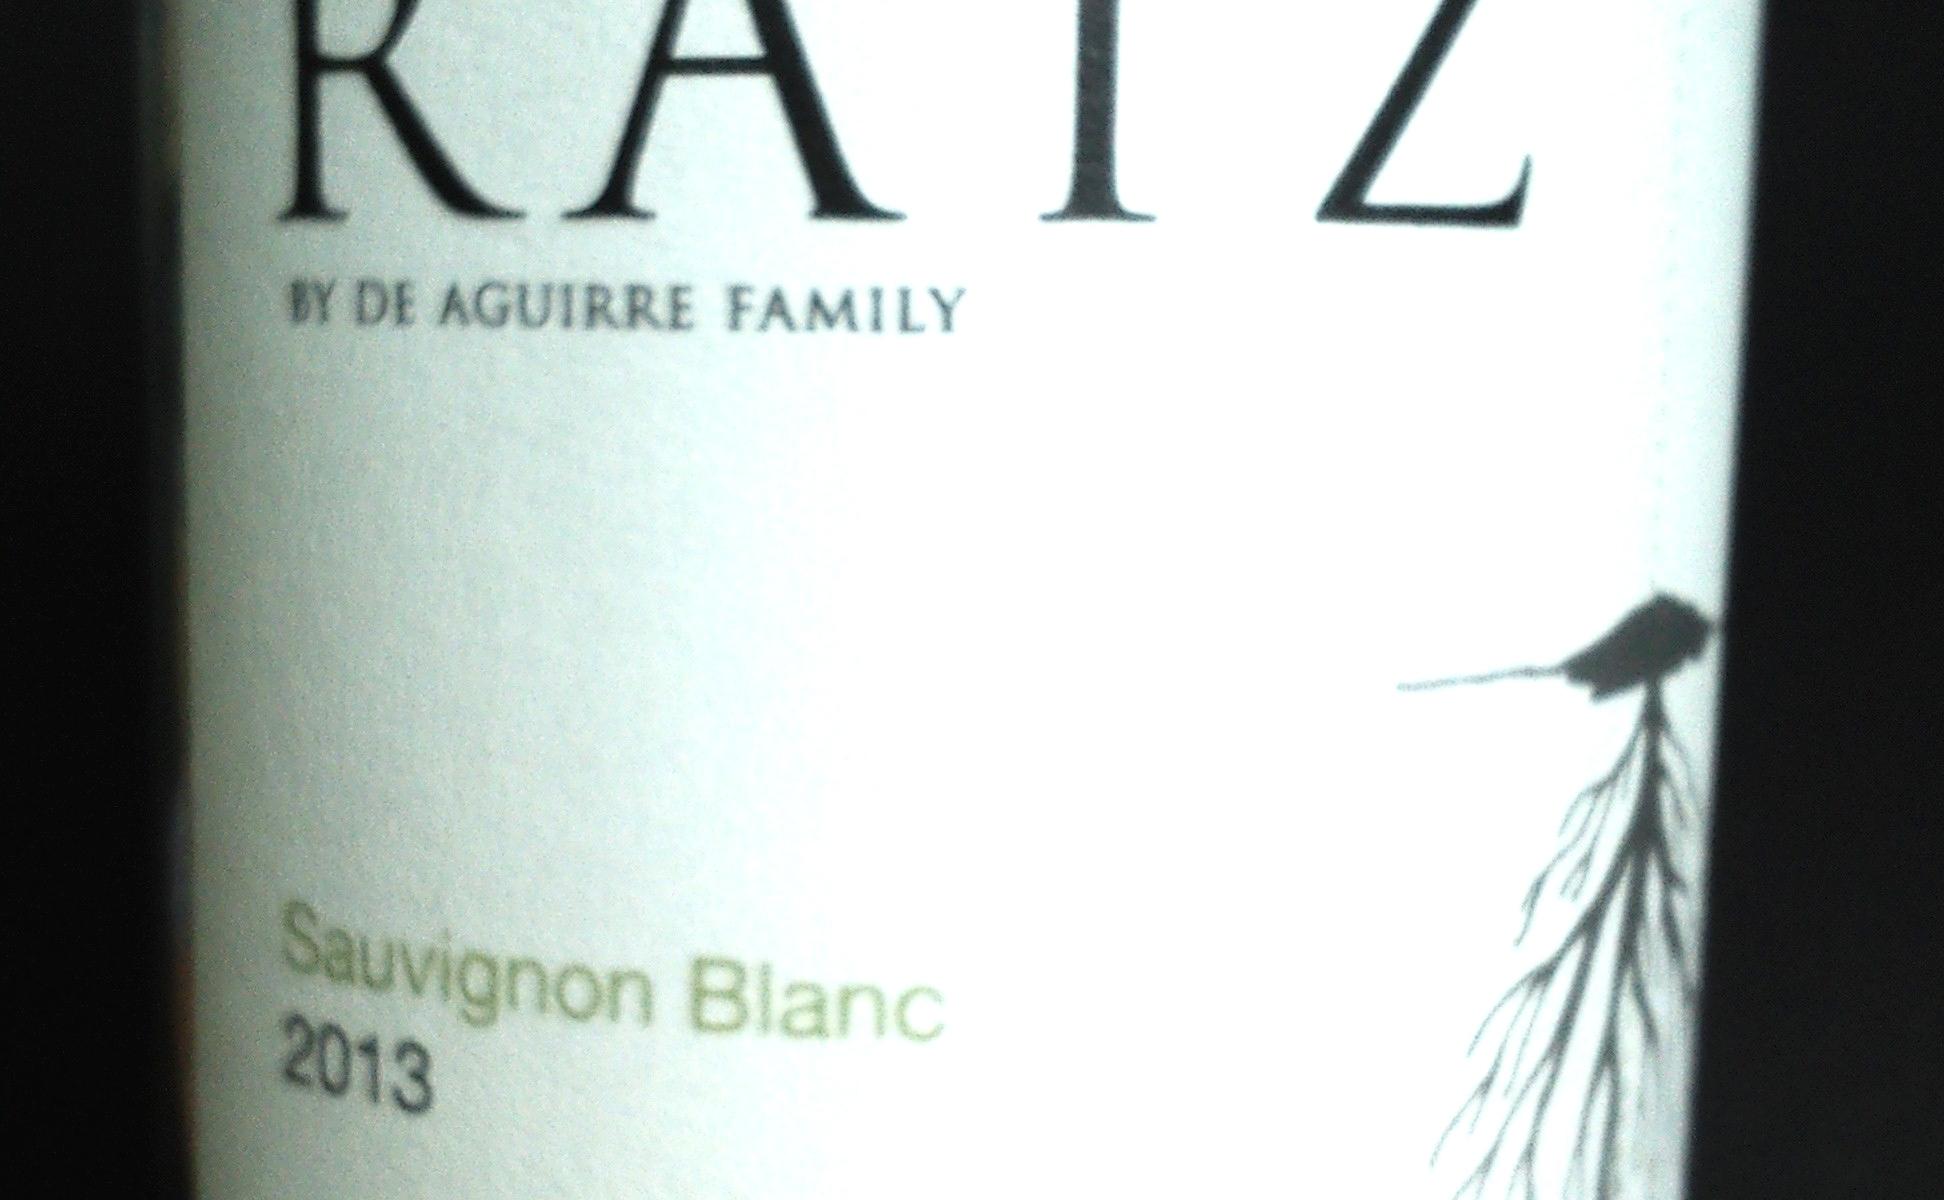 Raiz by De Augirre Family Sauvignon Blanc Maule Valley 2013